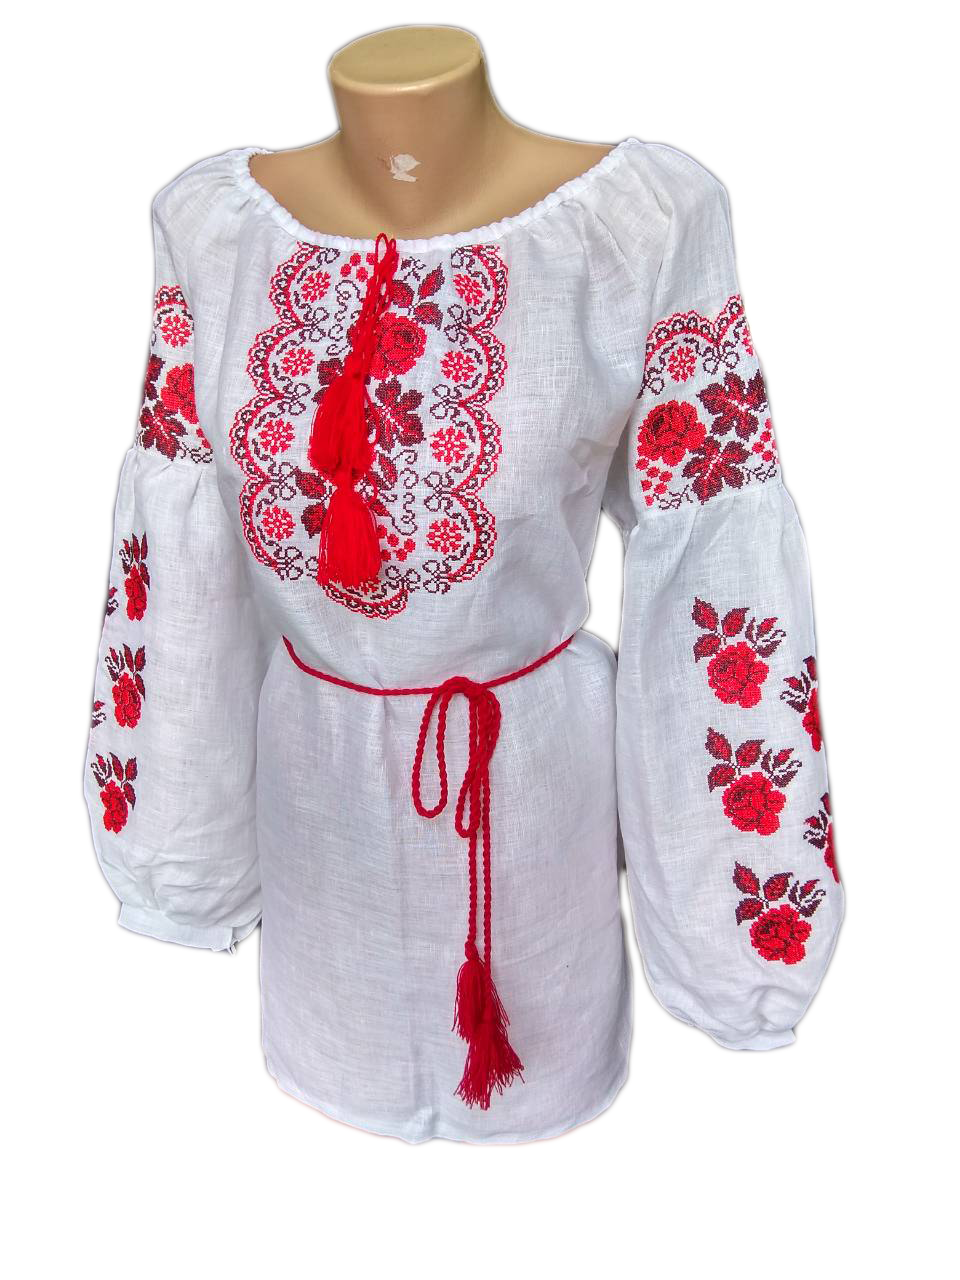 "Жіноча вишита сорочка (блузка) ""Ренді"" (Женская вышитая рубашка (блузка) ""Ренди"") BT-0038"